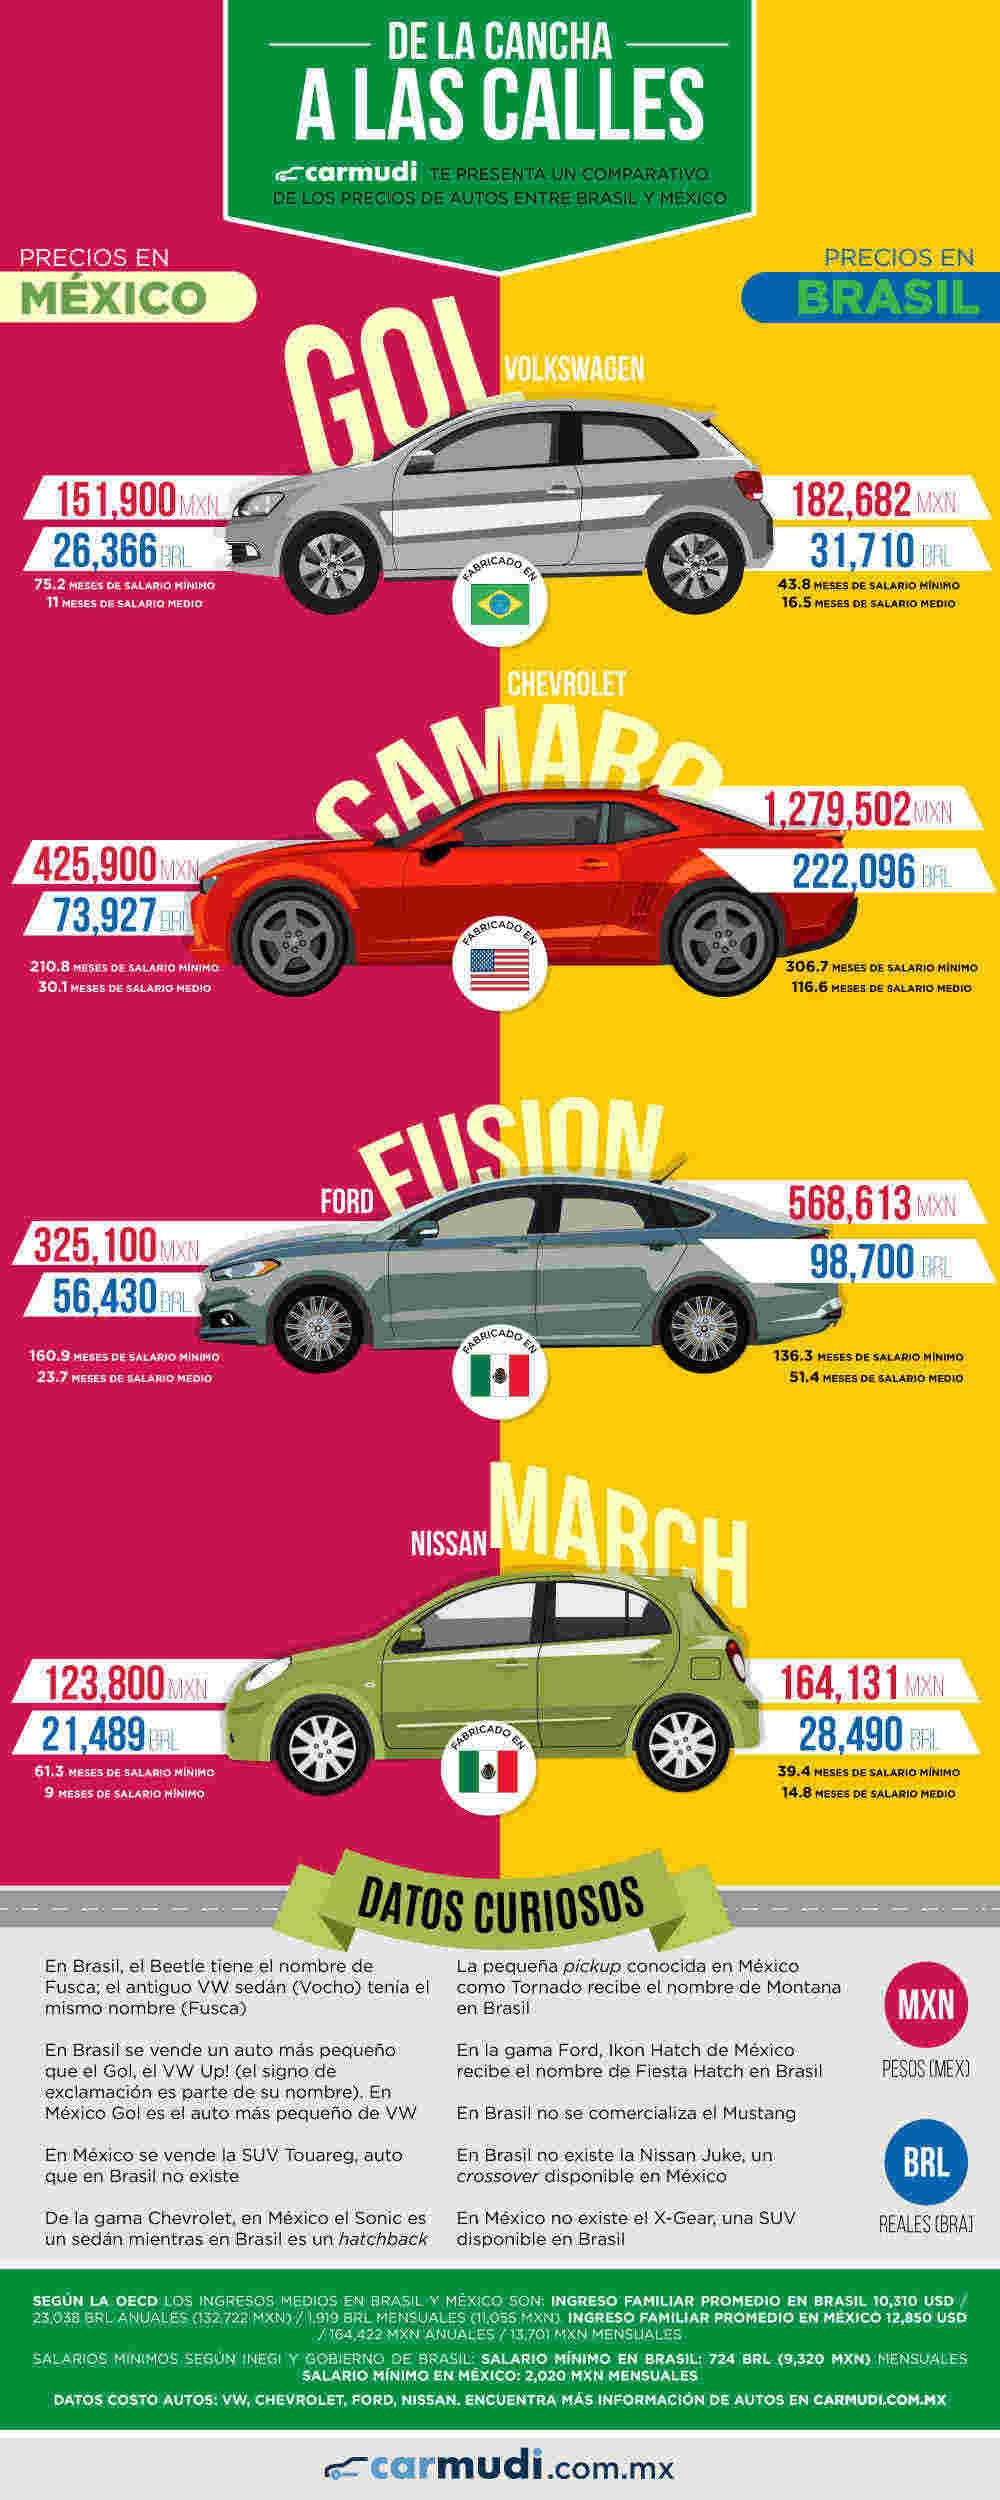 Infografía: Carmudi